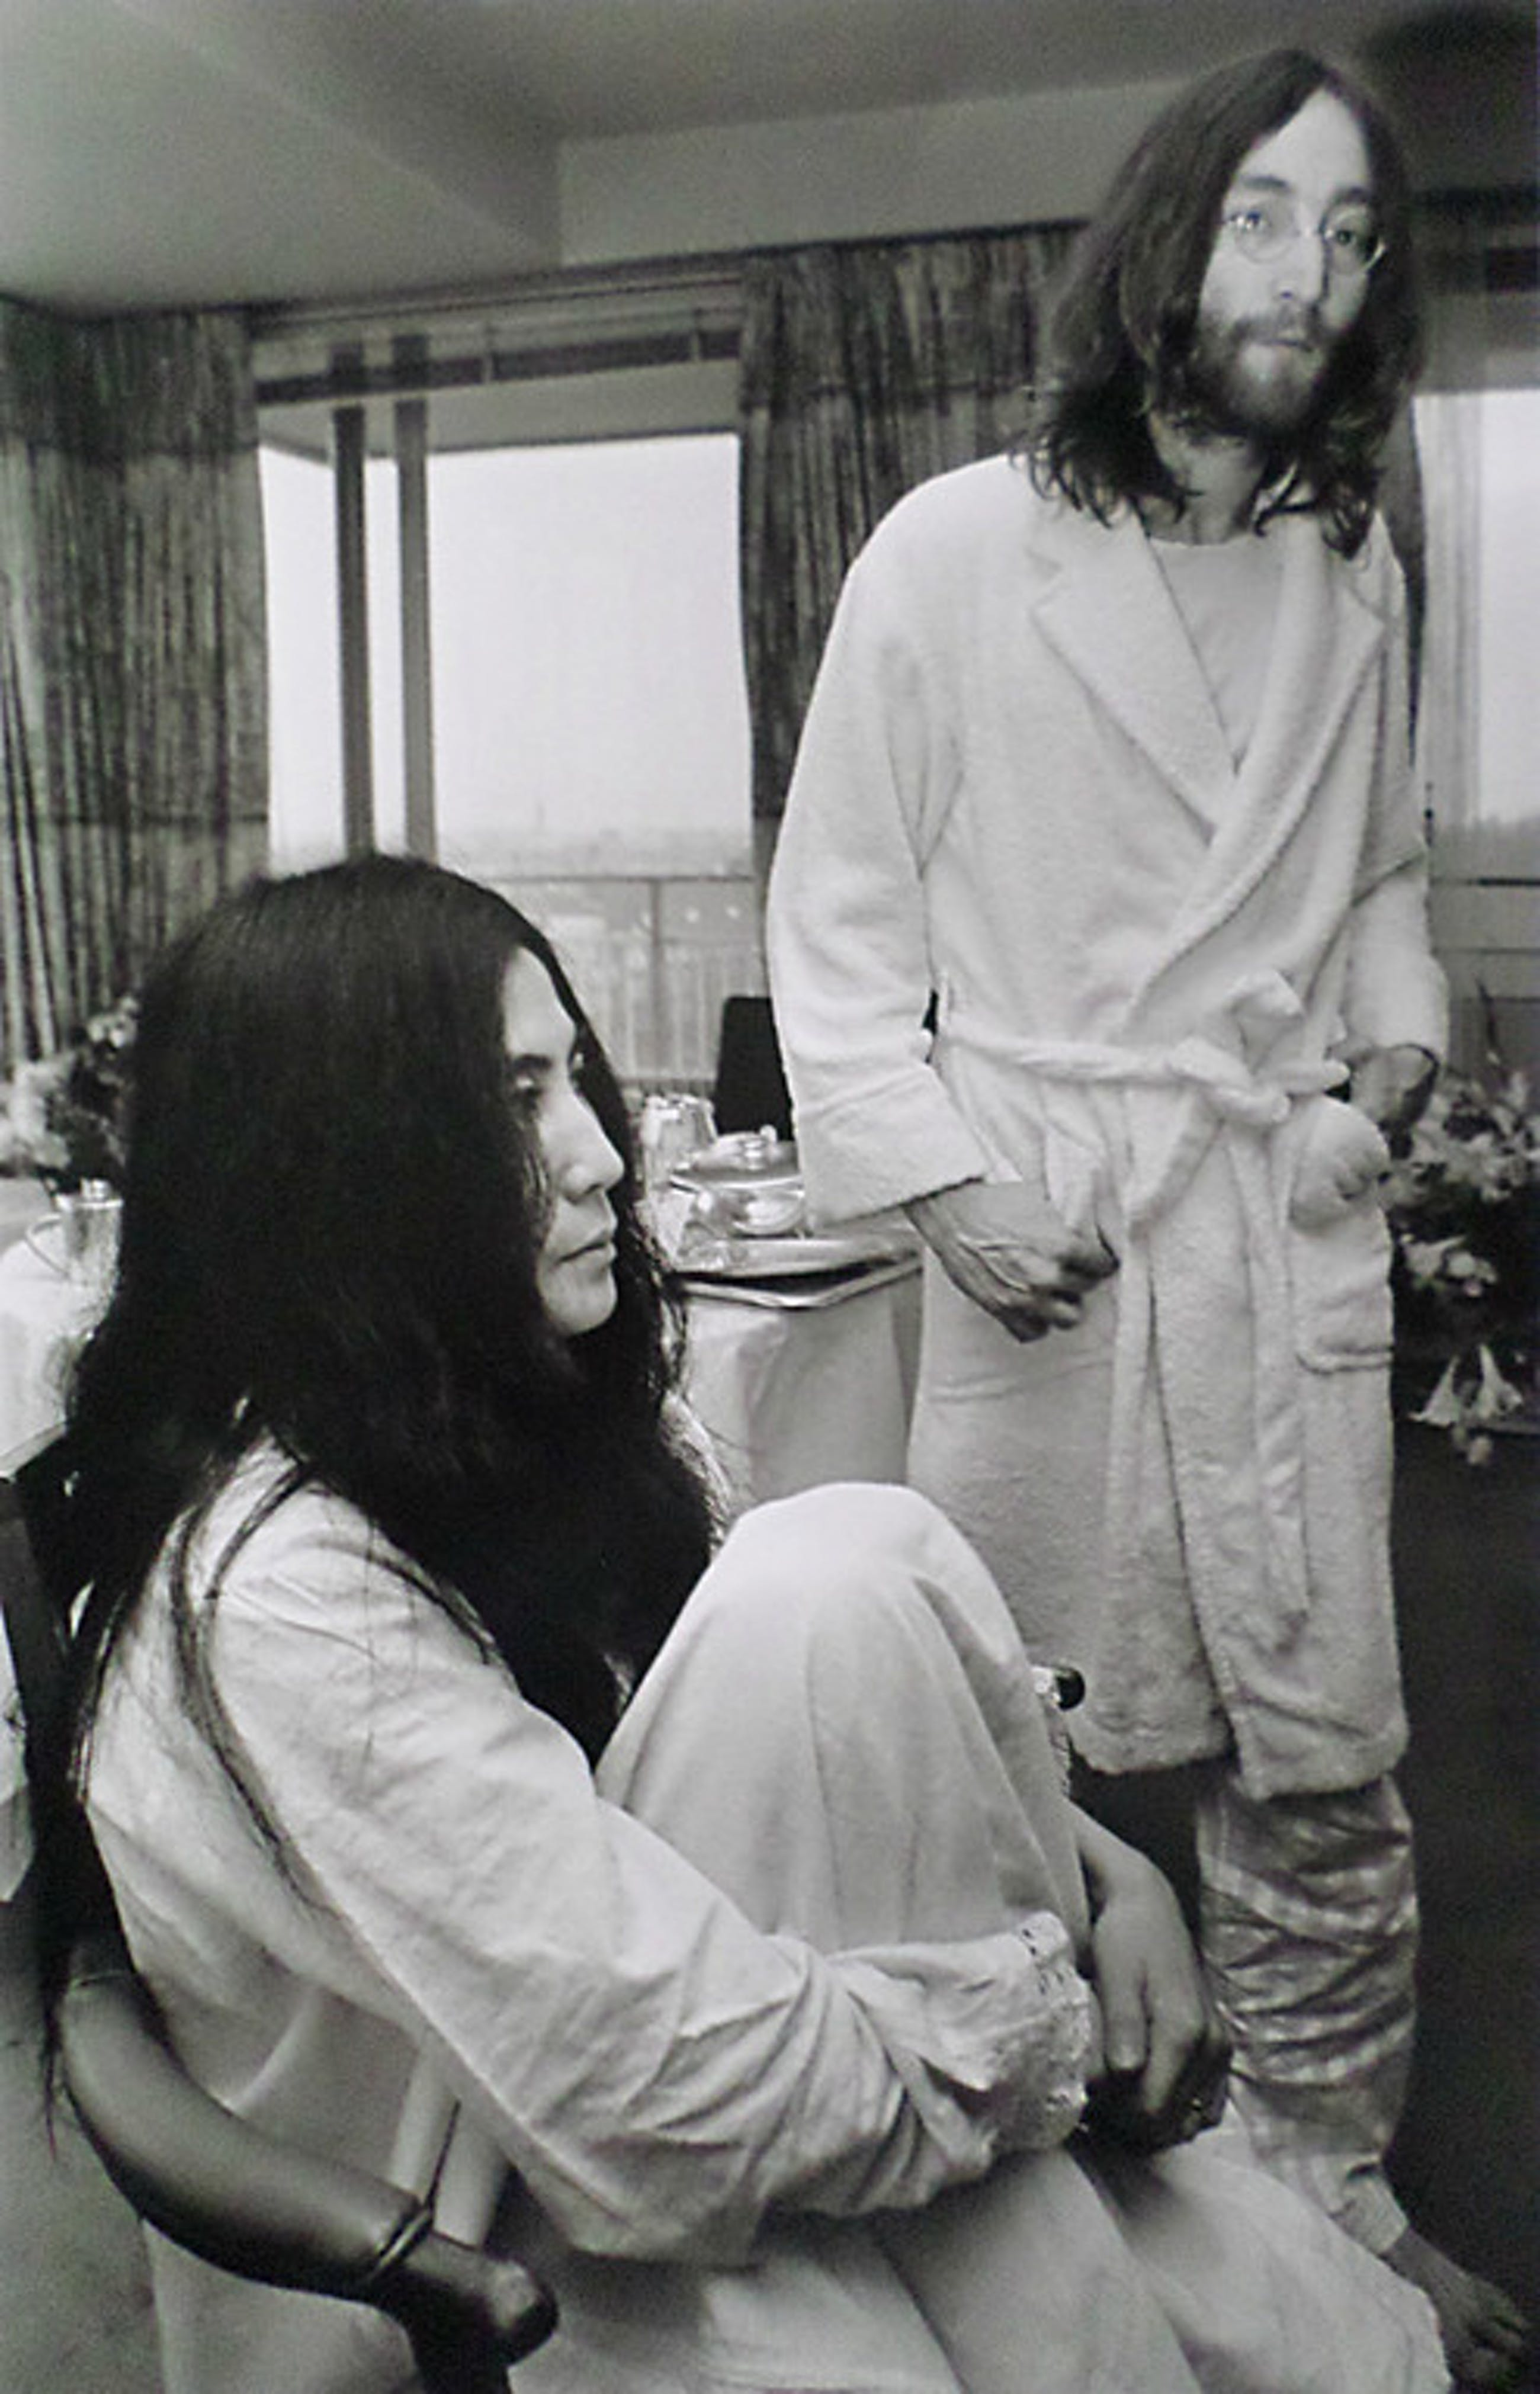 Nico Koster - John Lennon en Yoko Ono - Bed peace, foto, gesigneerd en genummerd kopen? Bied vanaf 150!